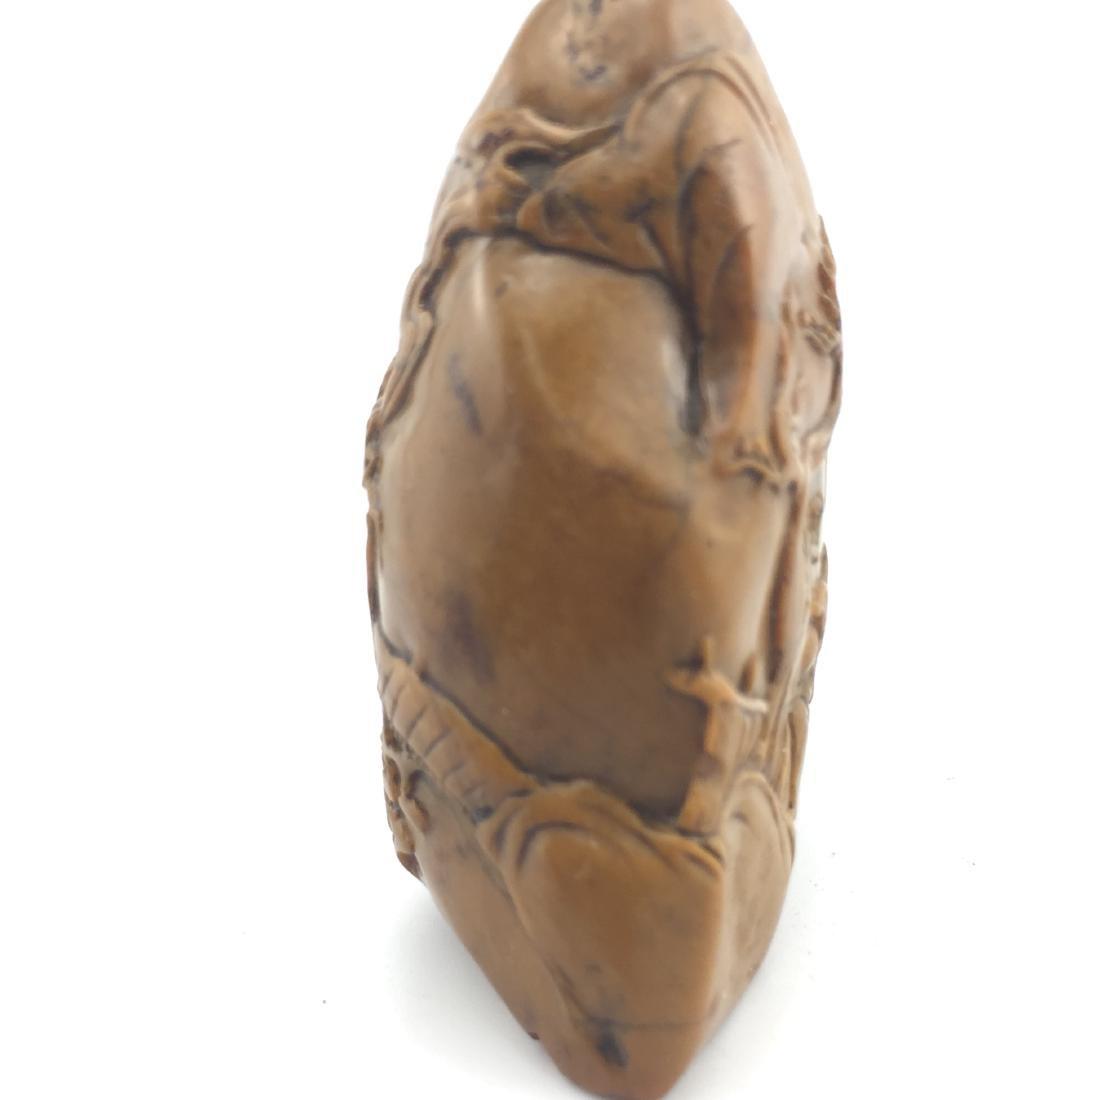 Antique Chinese SHOU SHAN HUANG Stone Seal - 9